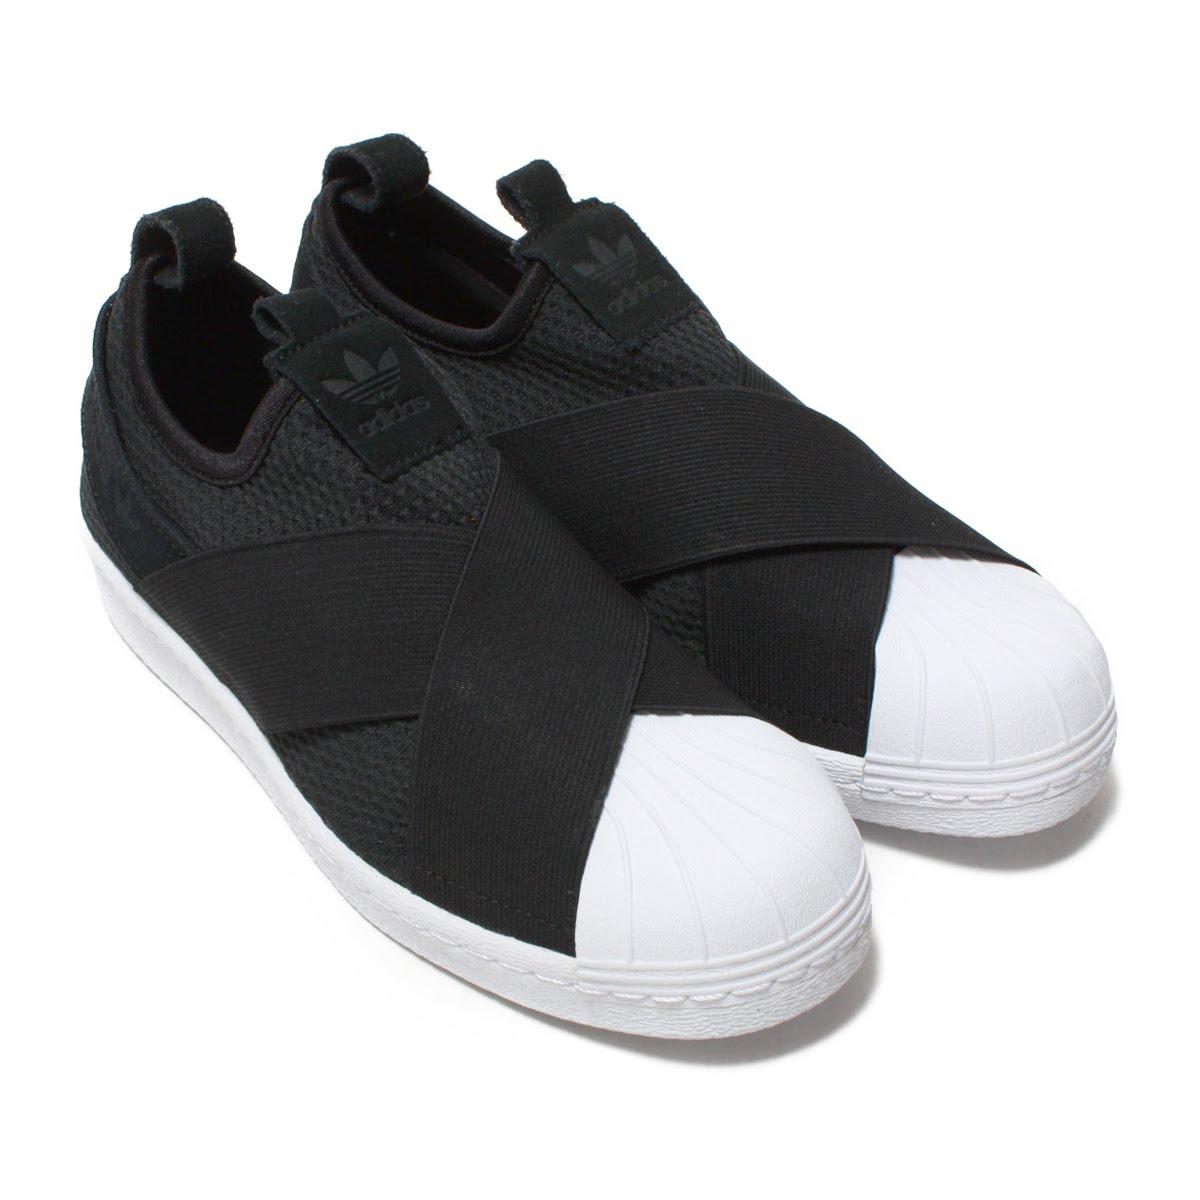 adidas superstar black and white slip on